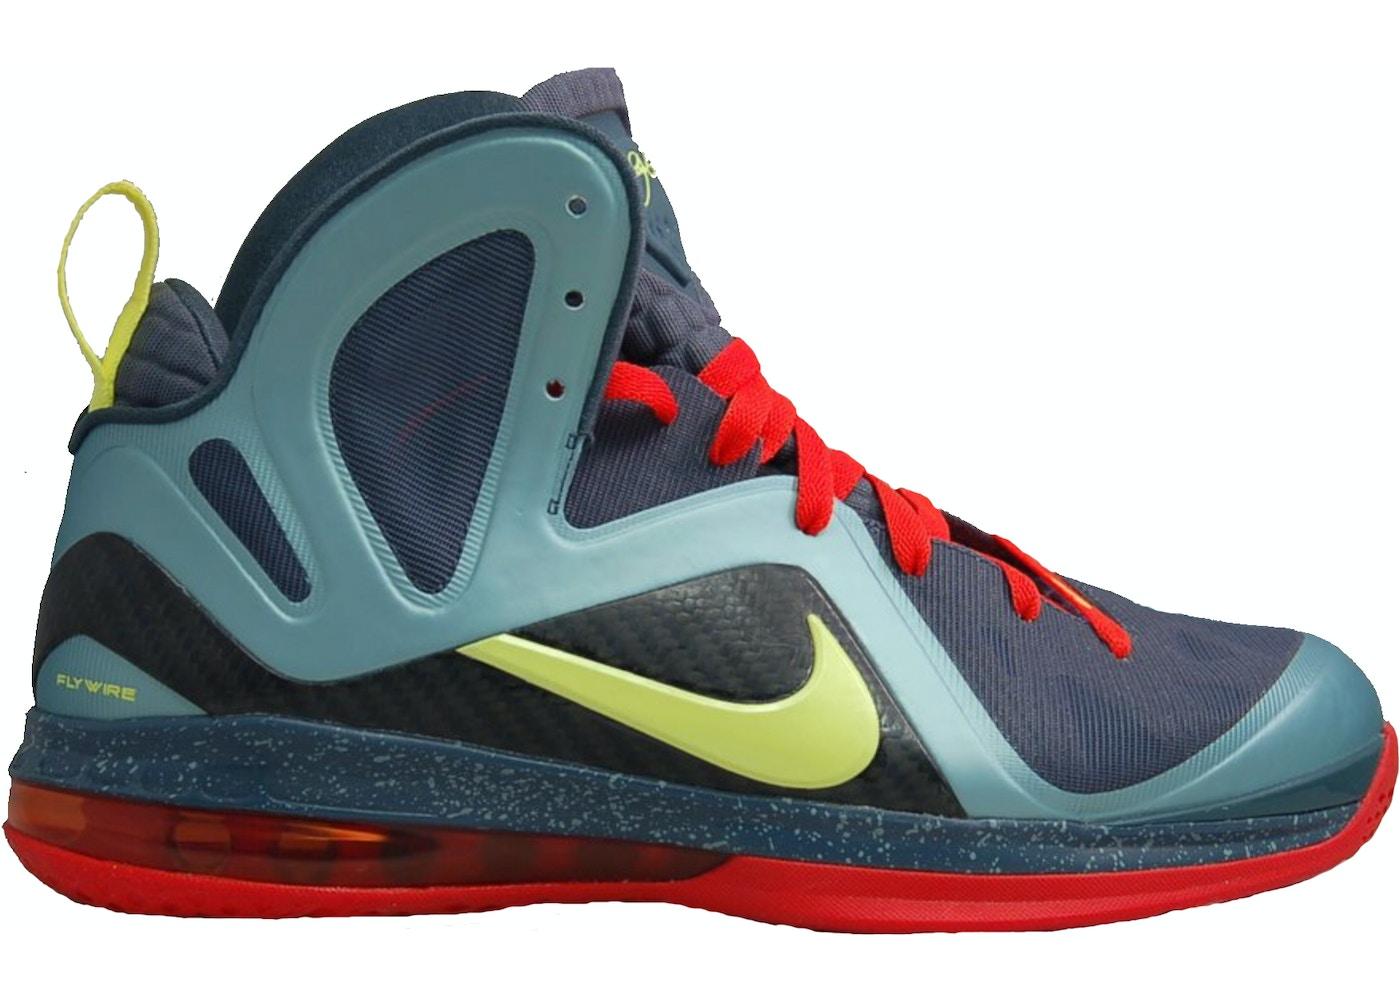 check out 4fb01 abc8e Nike LeBron 9 Shoes - Highest Bid